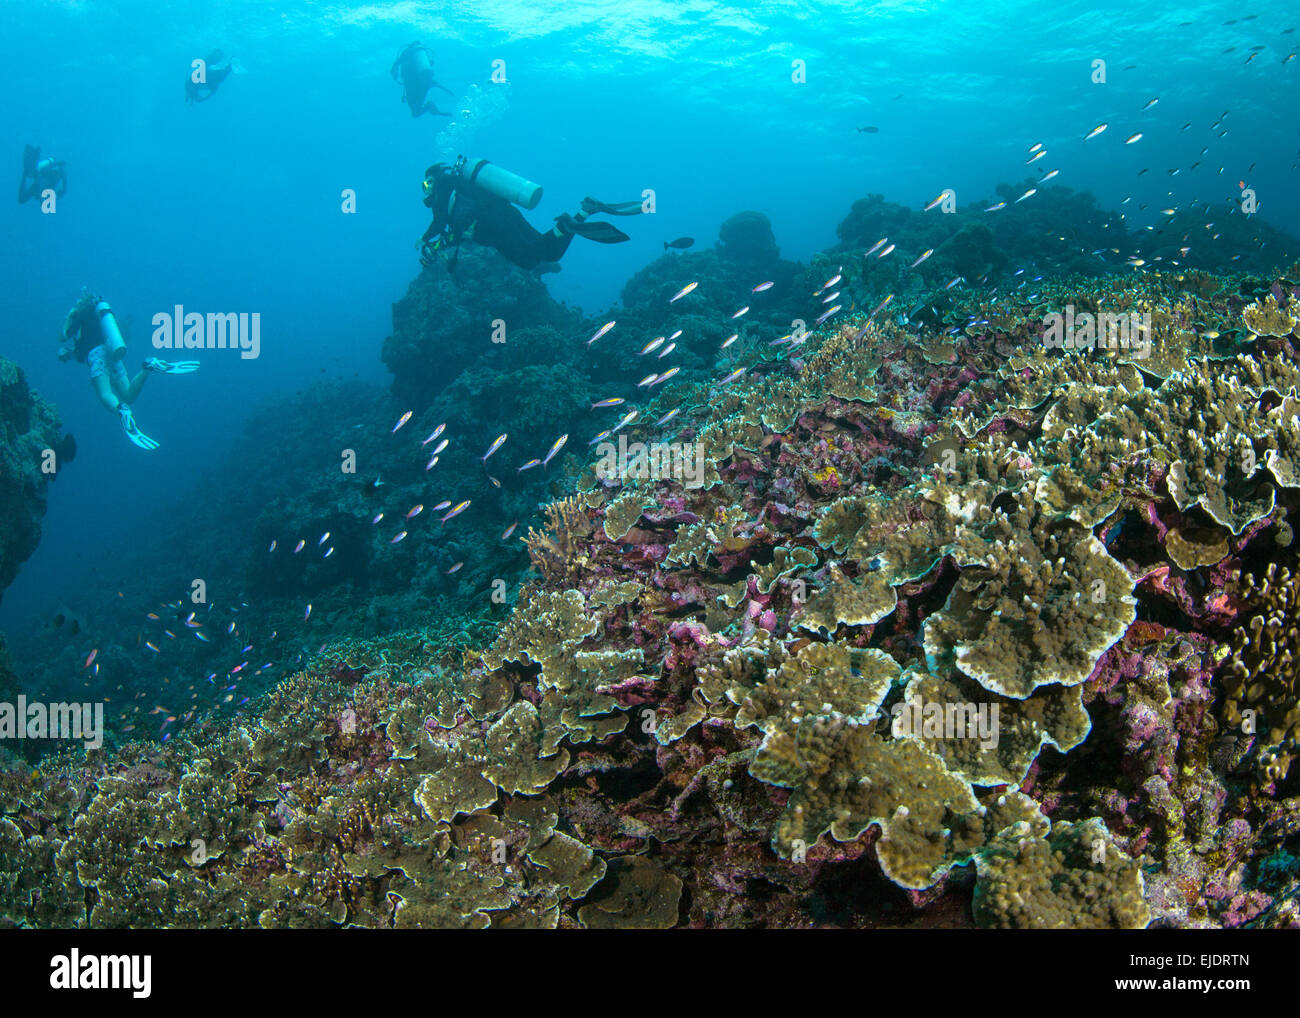 Scuba divers swim over hard coral reef (Montipora sp.). Spratly Island, South China Sea. - Stock Image